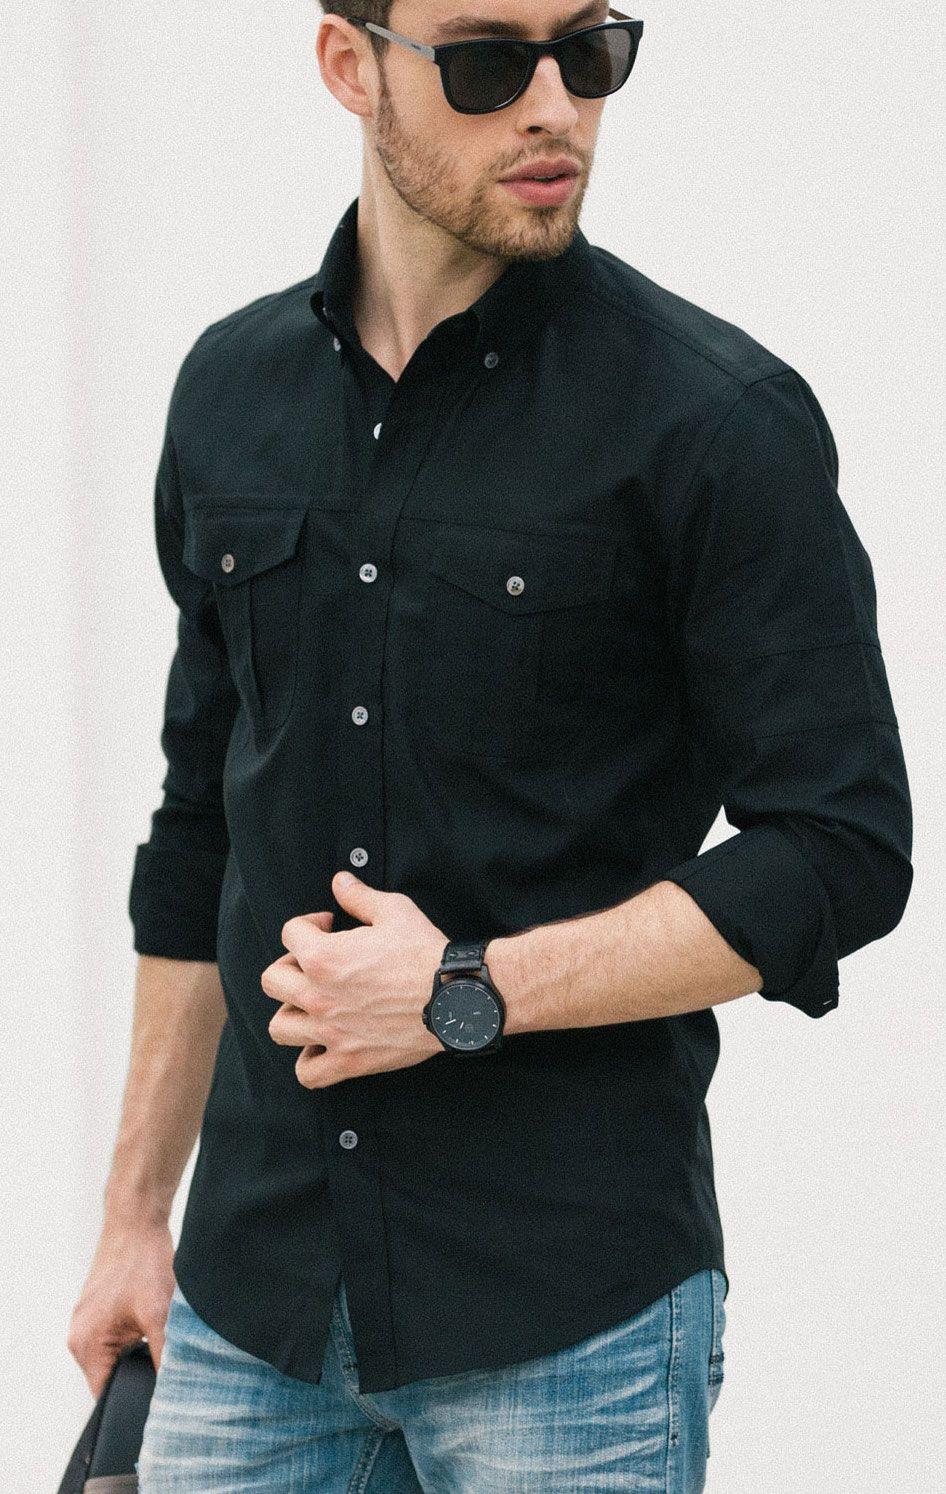 Batch Editor Men S Button Down Shirt In Jet Black Black Shirt Outfit Men Shirt Outfit Men Black Shirt Outfits [ 1494 x 946 Pixel ]